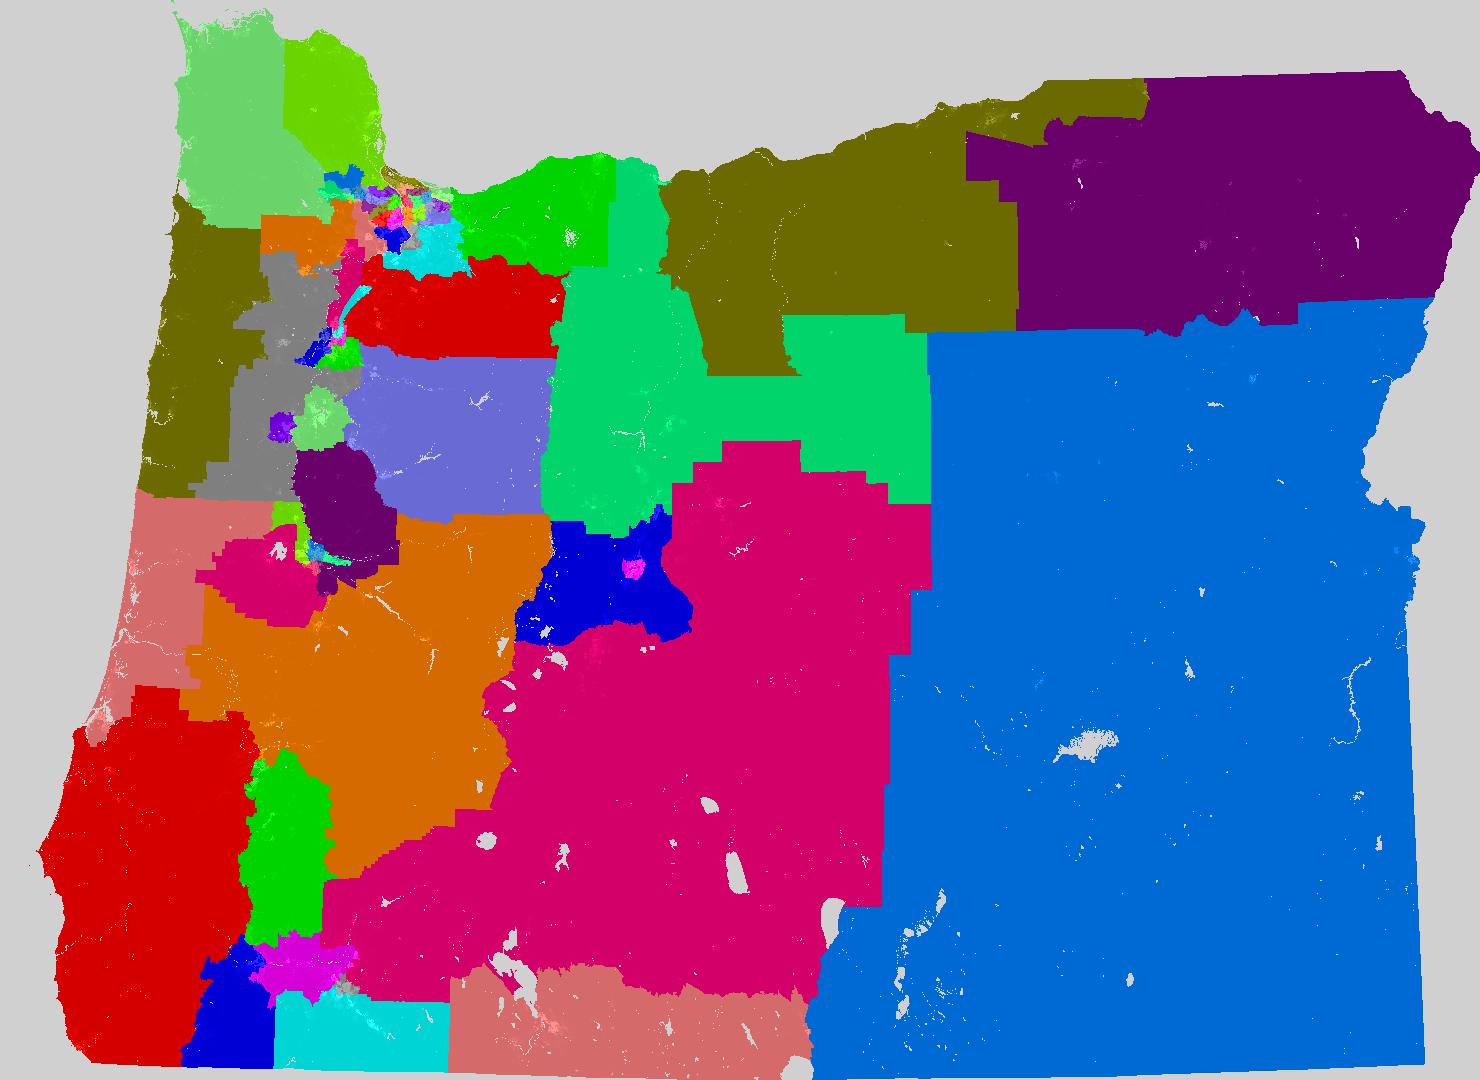 Oregon House Of Representatives Map Oregon House of Representatives Redistricting